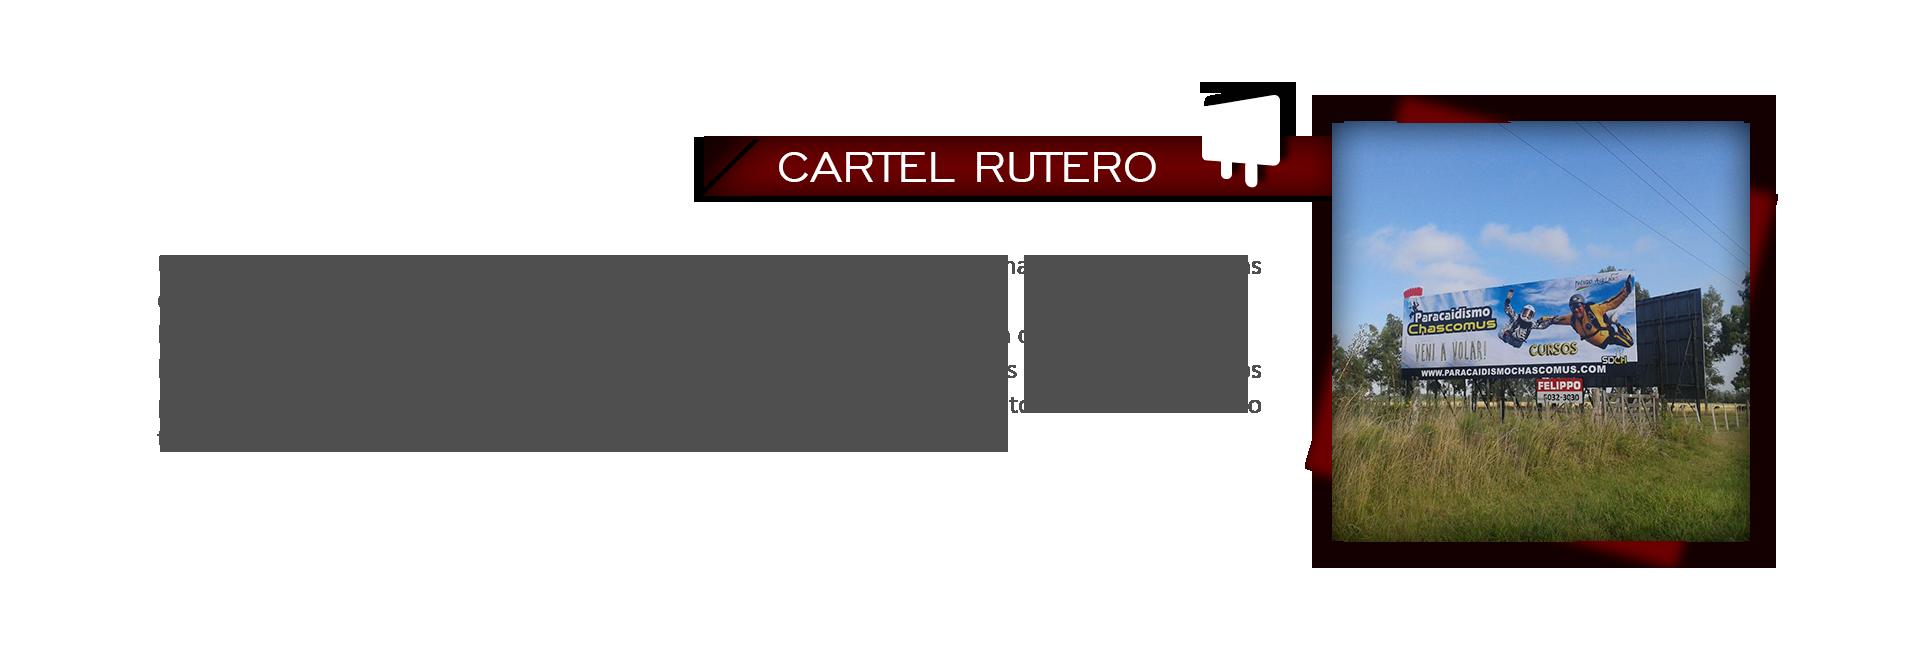 img_cartelrutero